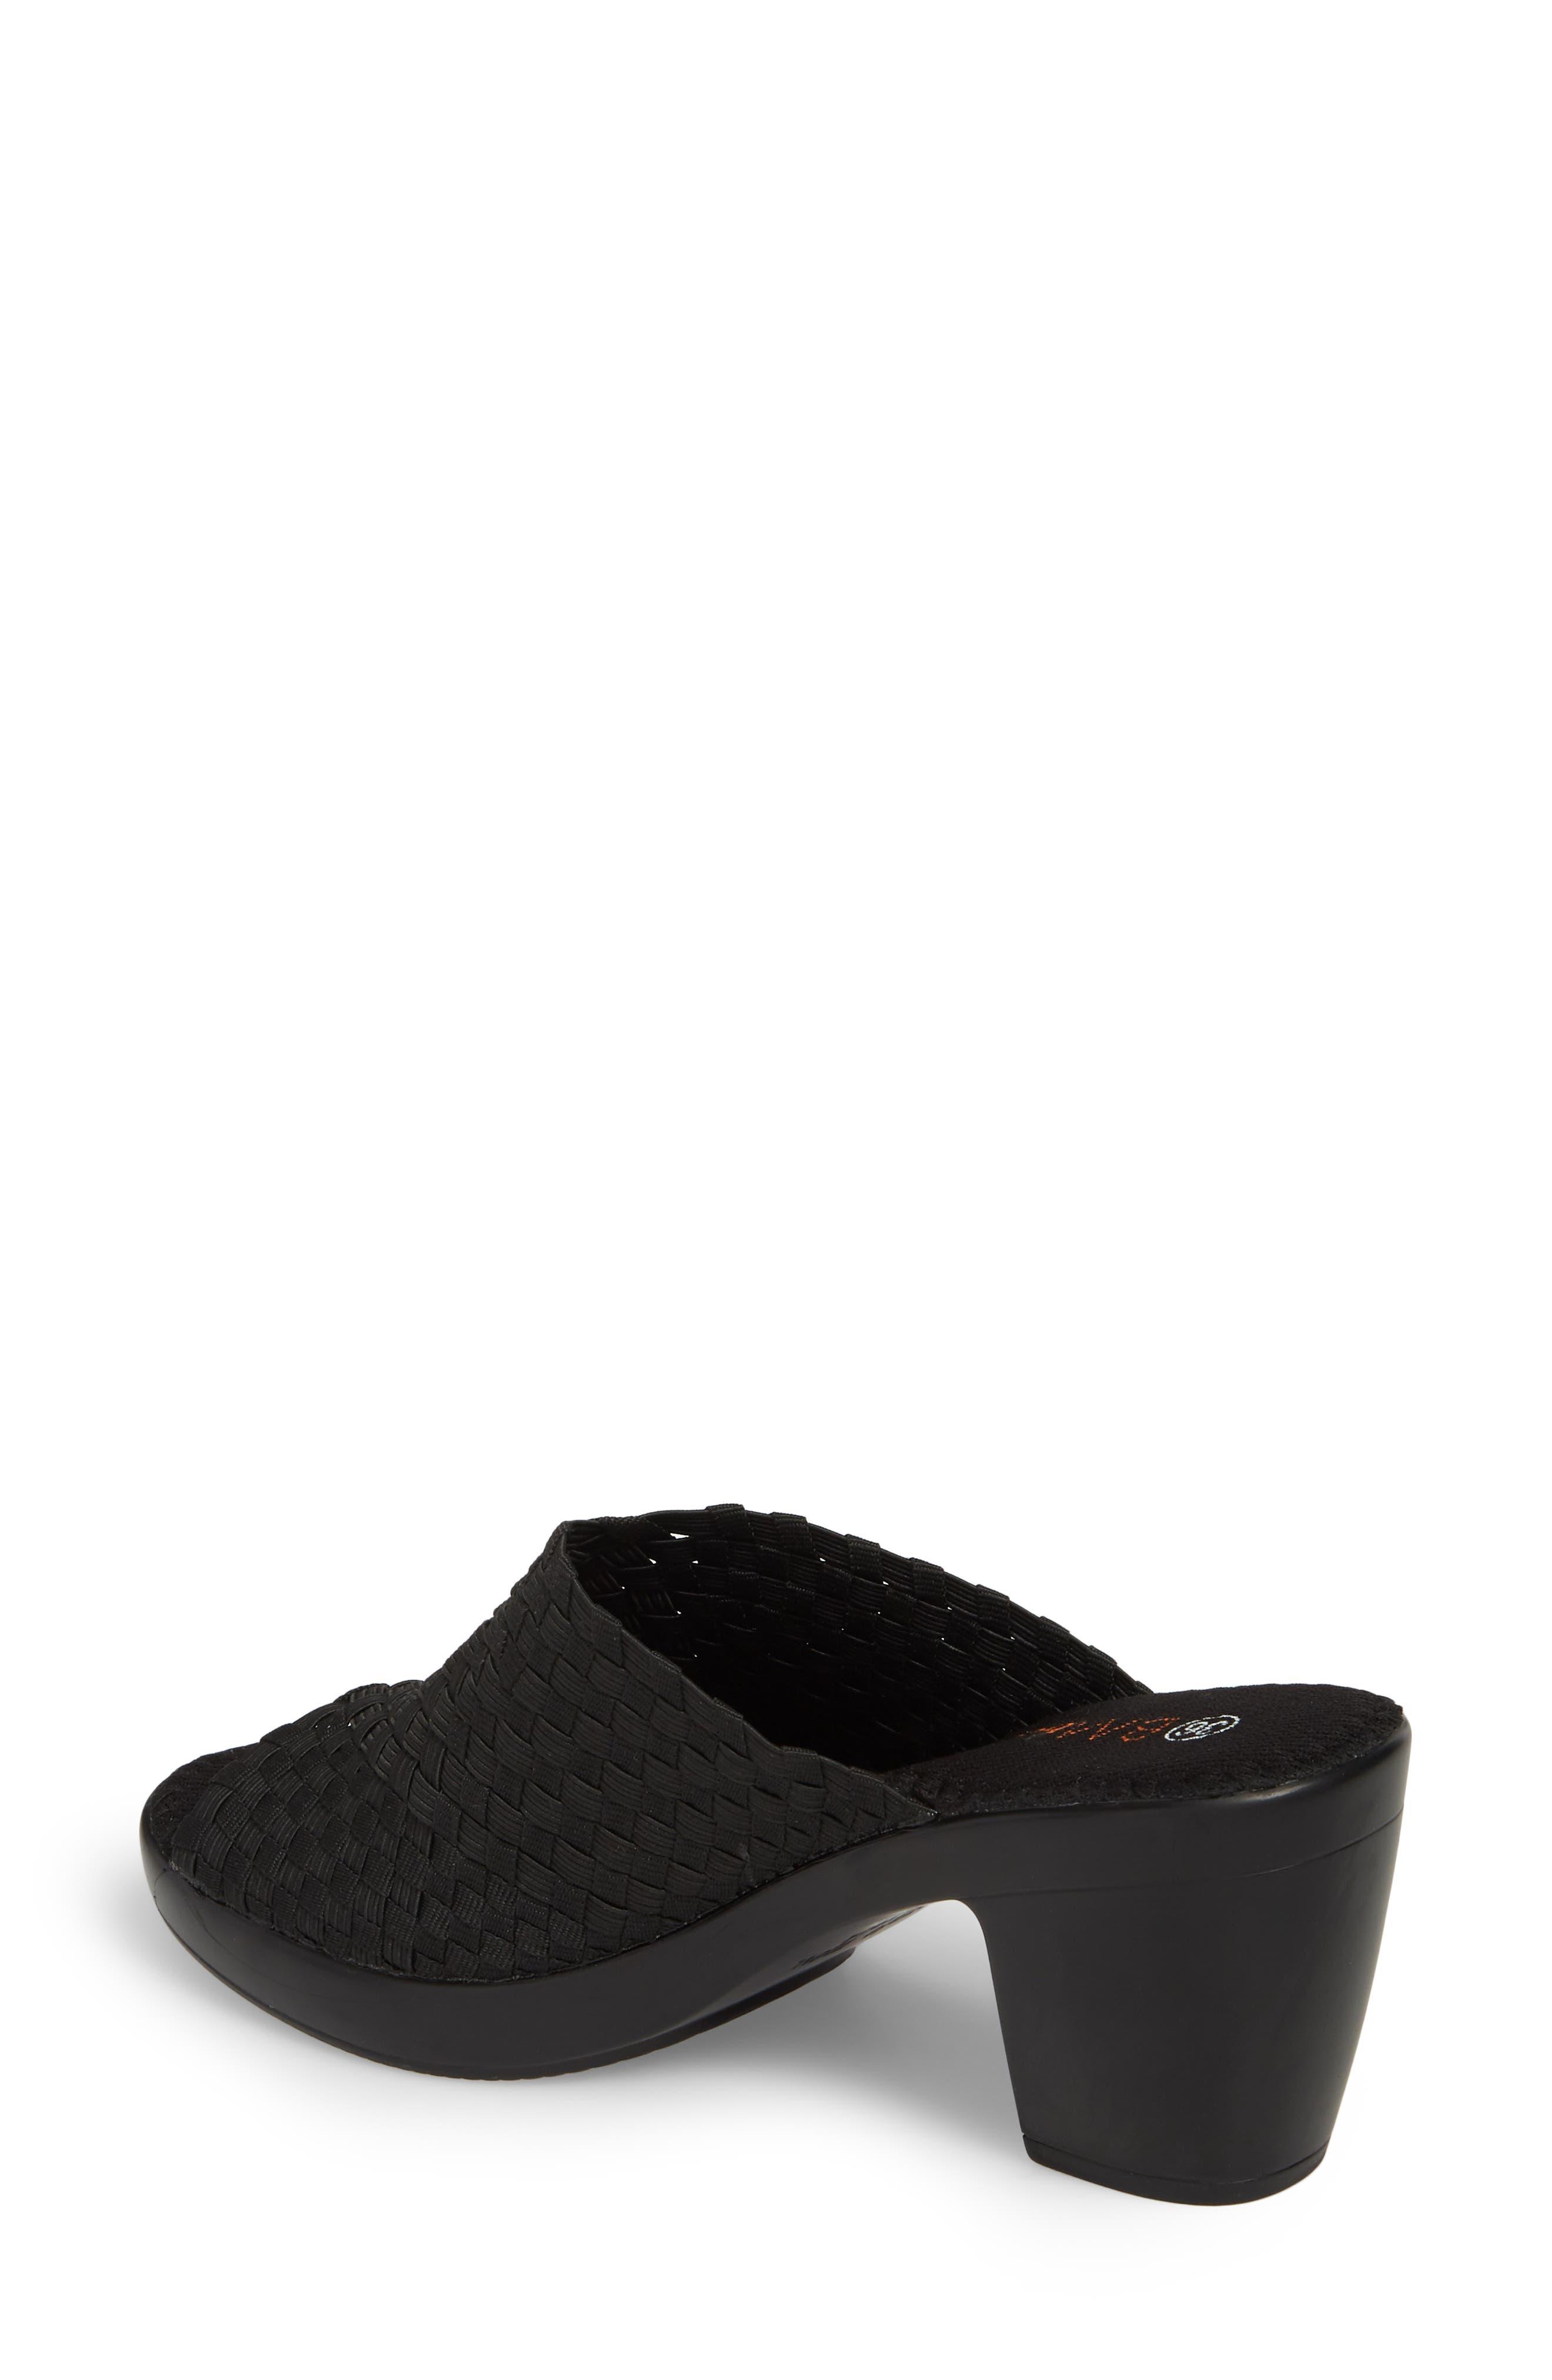 Sun Texas Sandal,                             Alternate thumbnail 2, color,                             BLACK FABRIC